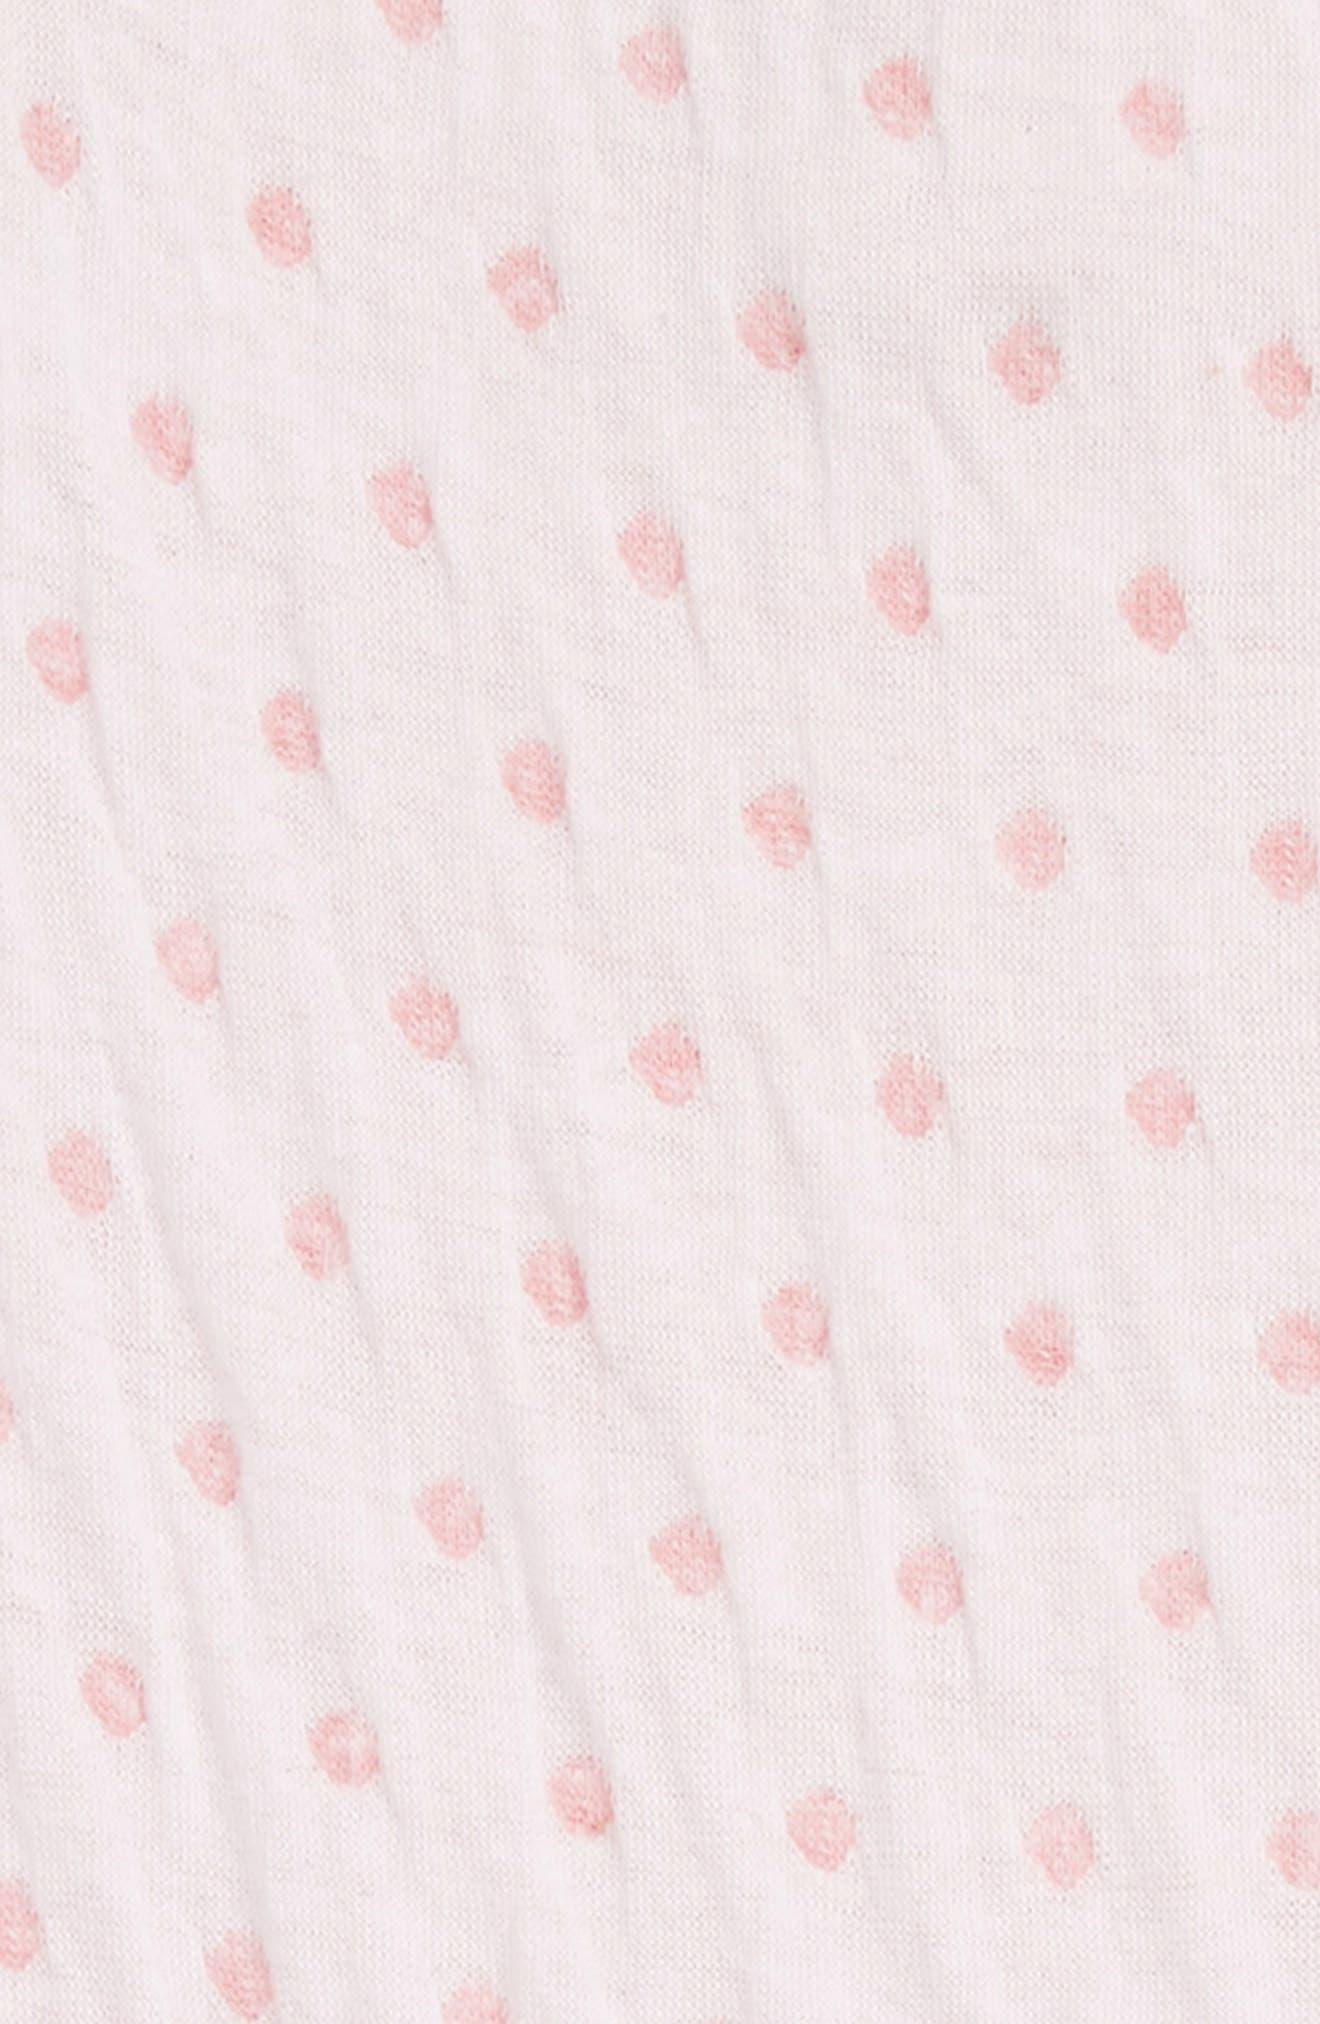 2-Fer Coveralls,                             Alternate thumbnail 2, color,                             PINK BRIDE DOTS